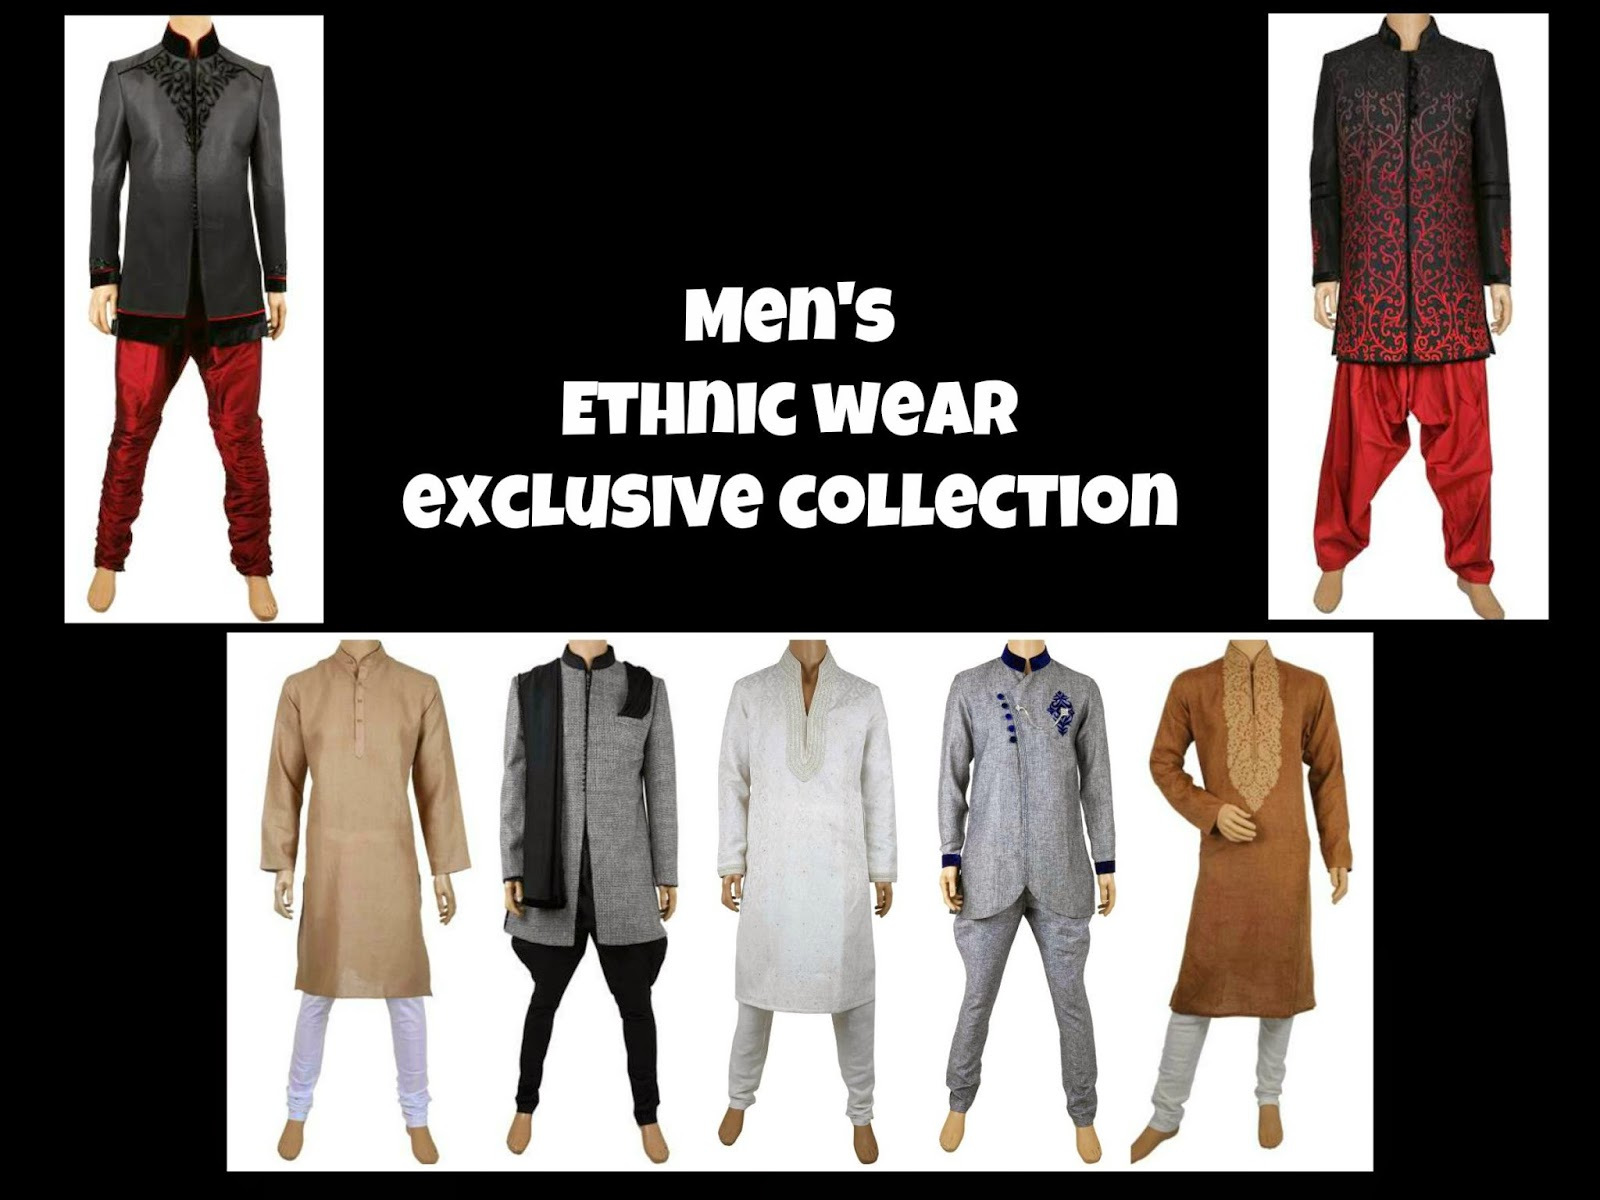 eid collection 2014 for men,eid men clothing, eid men designer collection, exclusive mens eid collection, eid designer collection,